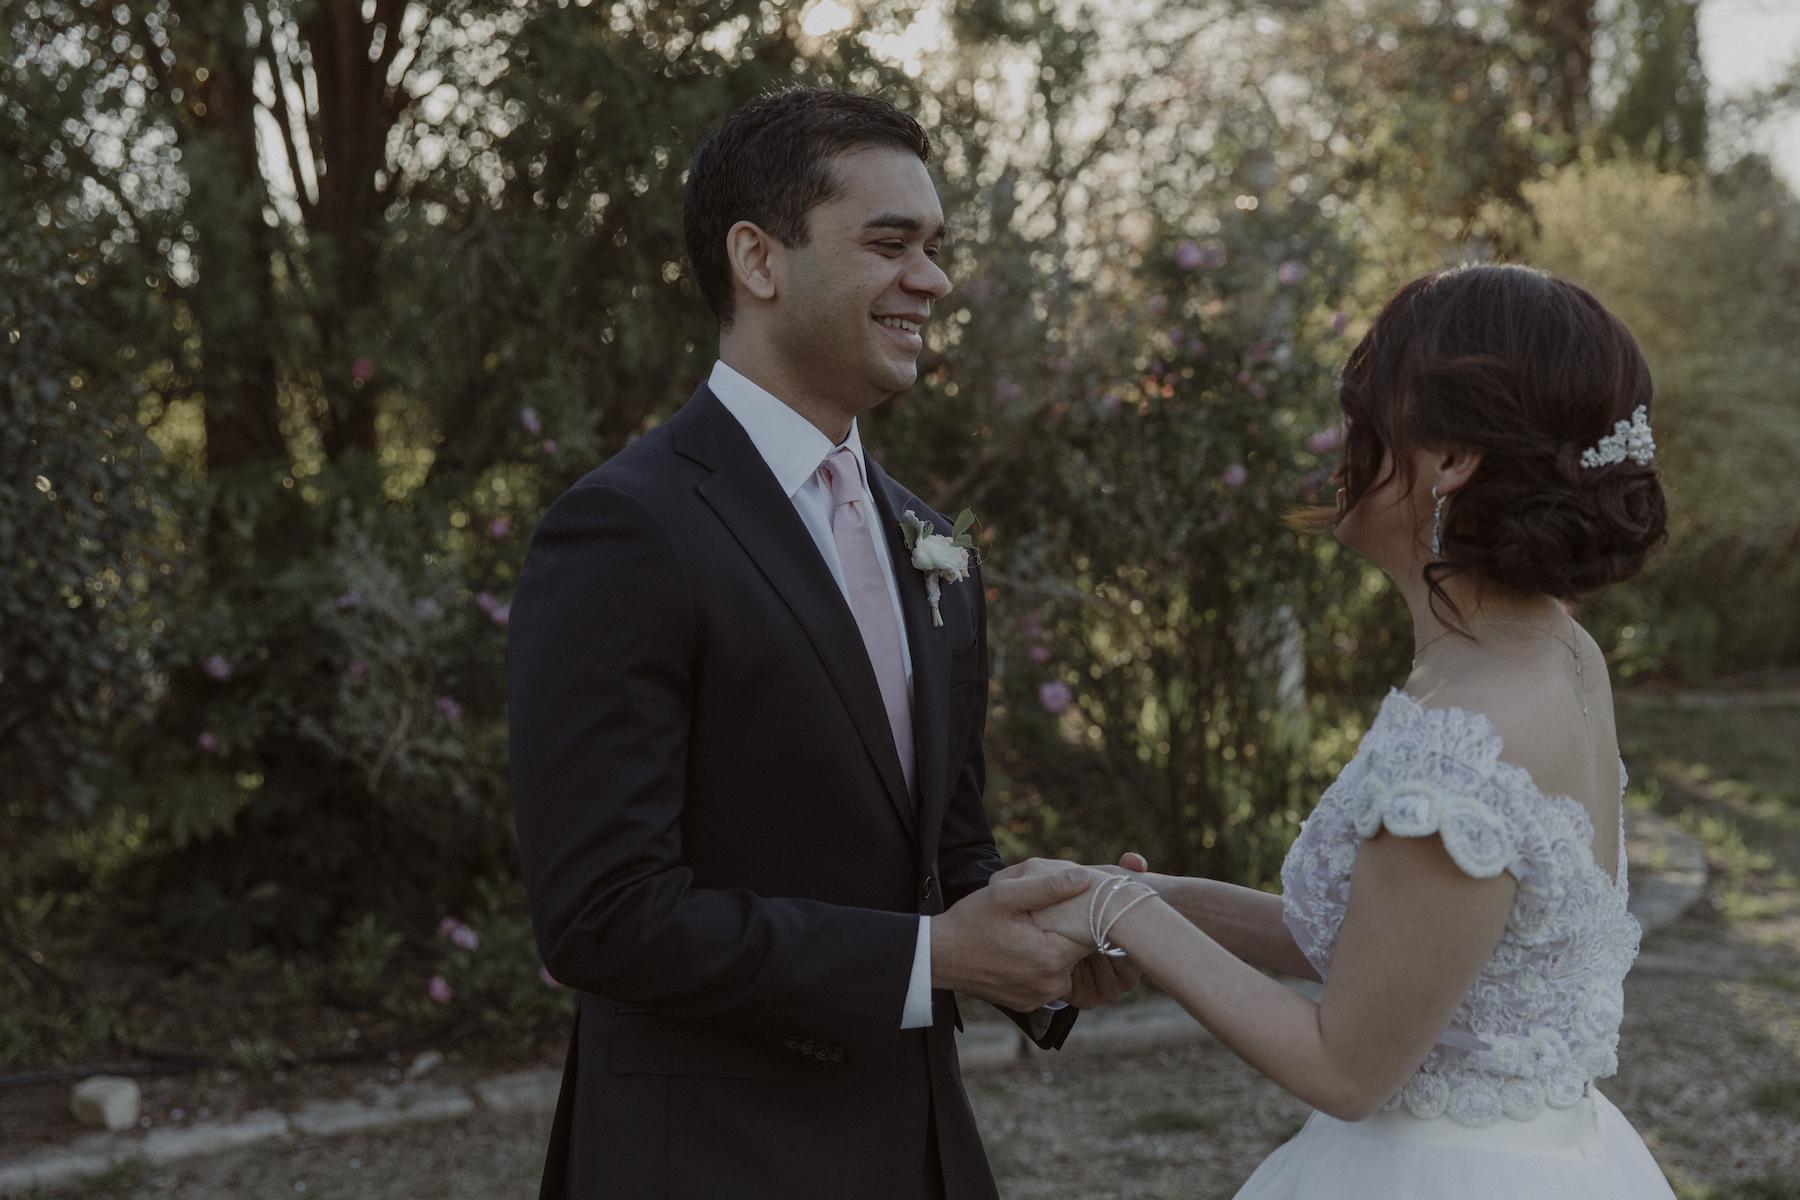 barr-mansion-wedding-austin-texas8872.JPG